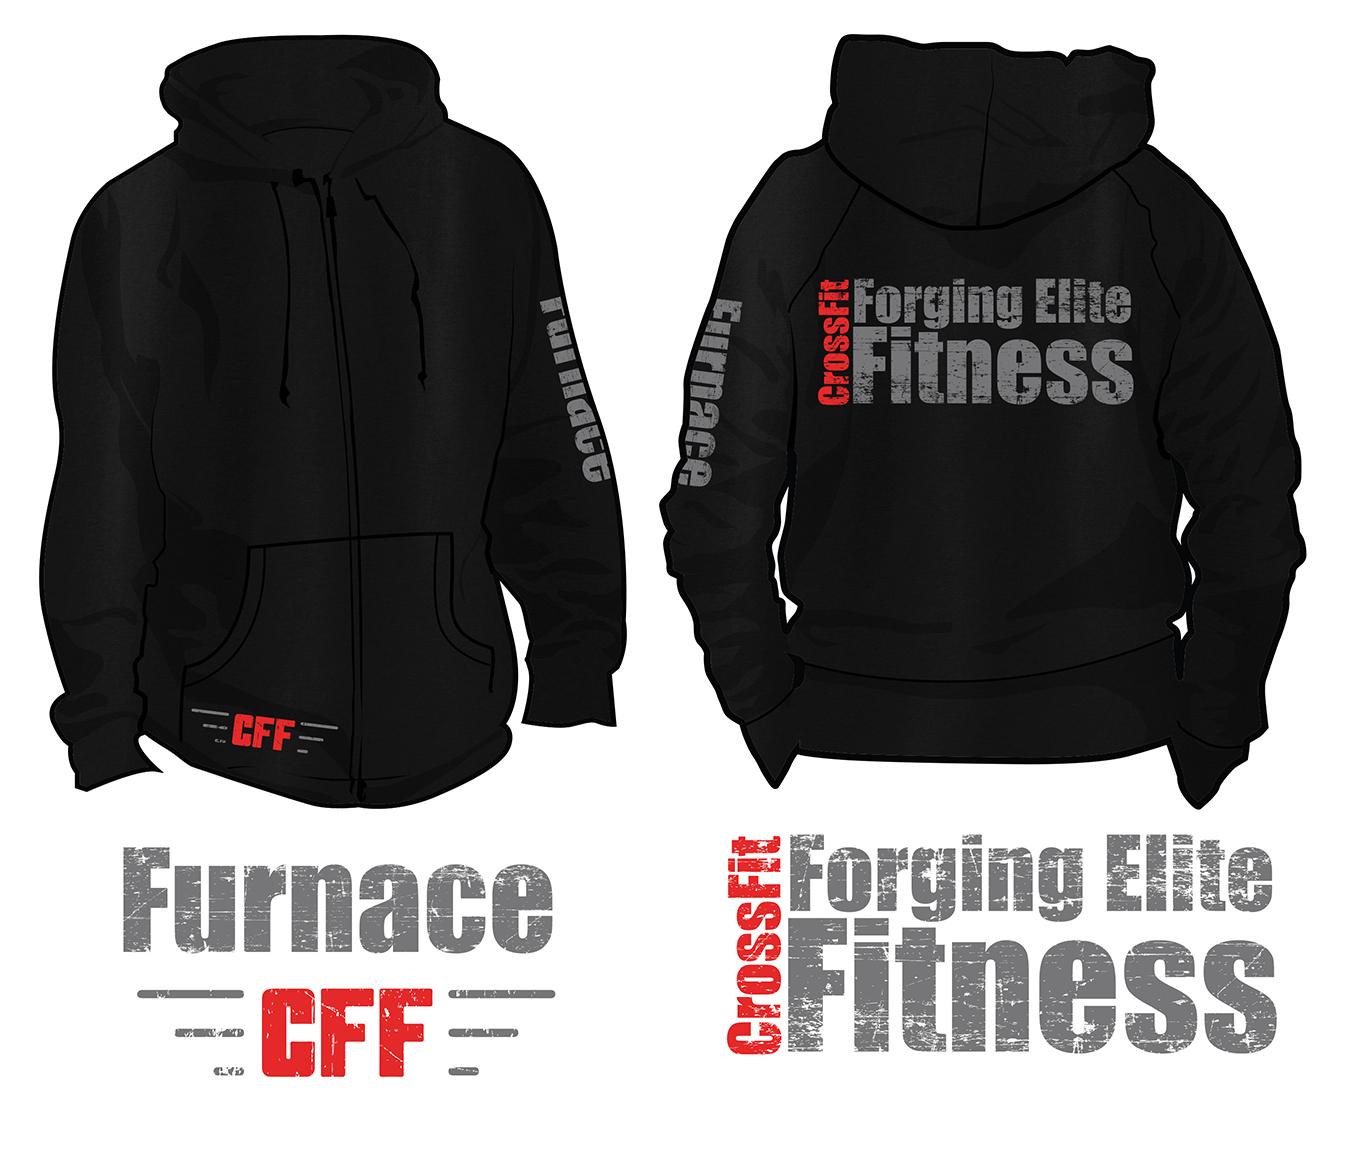 7eeffe751 T-shirt Design by 10V3GRAPHX for CrossFit Furnace   Design #14926792